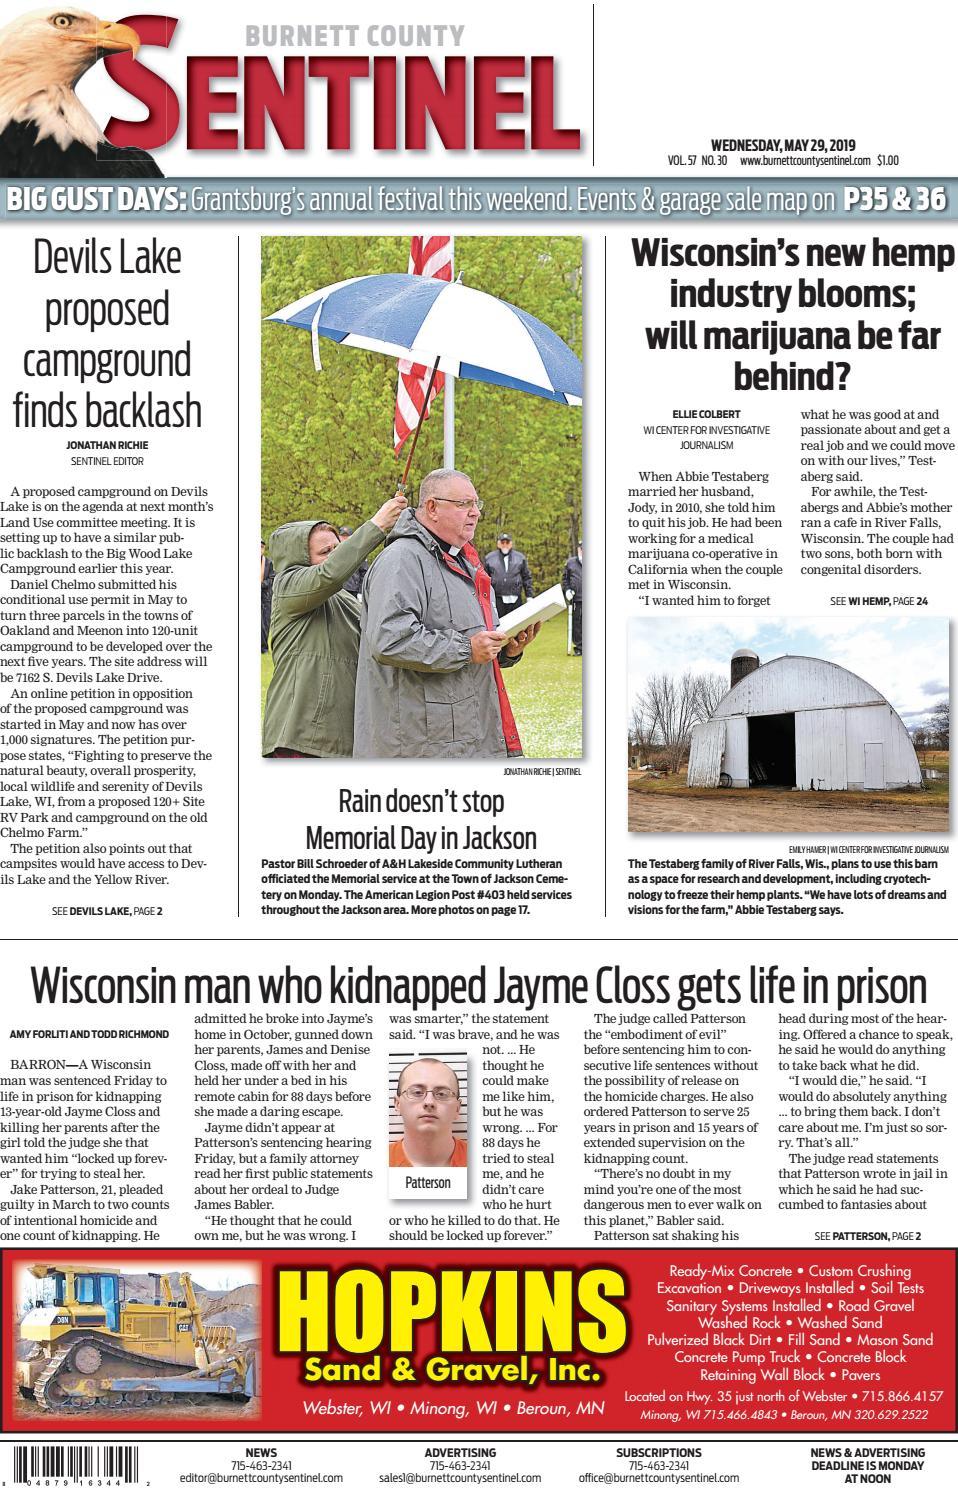 The Burnett County Sentinel 05-29-2019 by Burnett County Sentinel